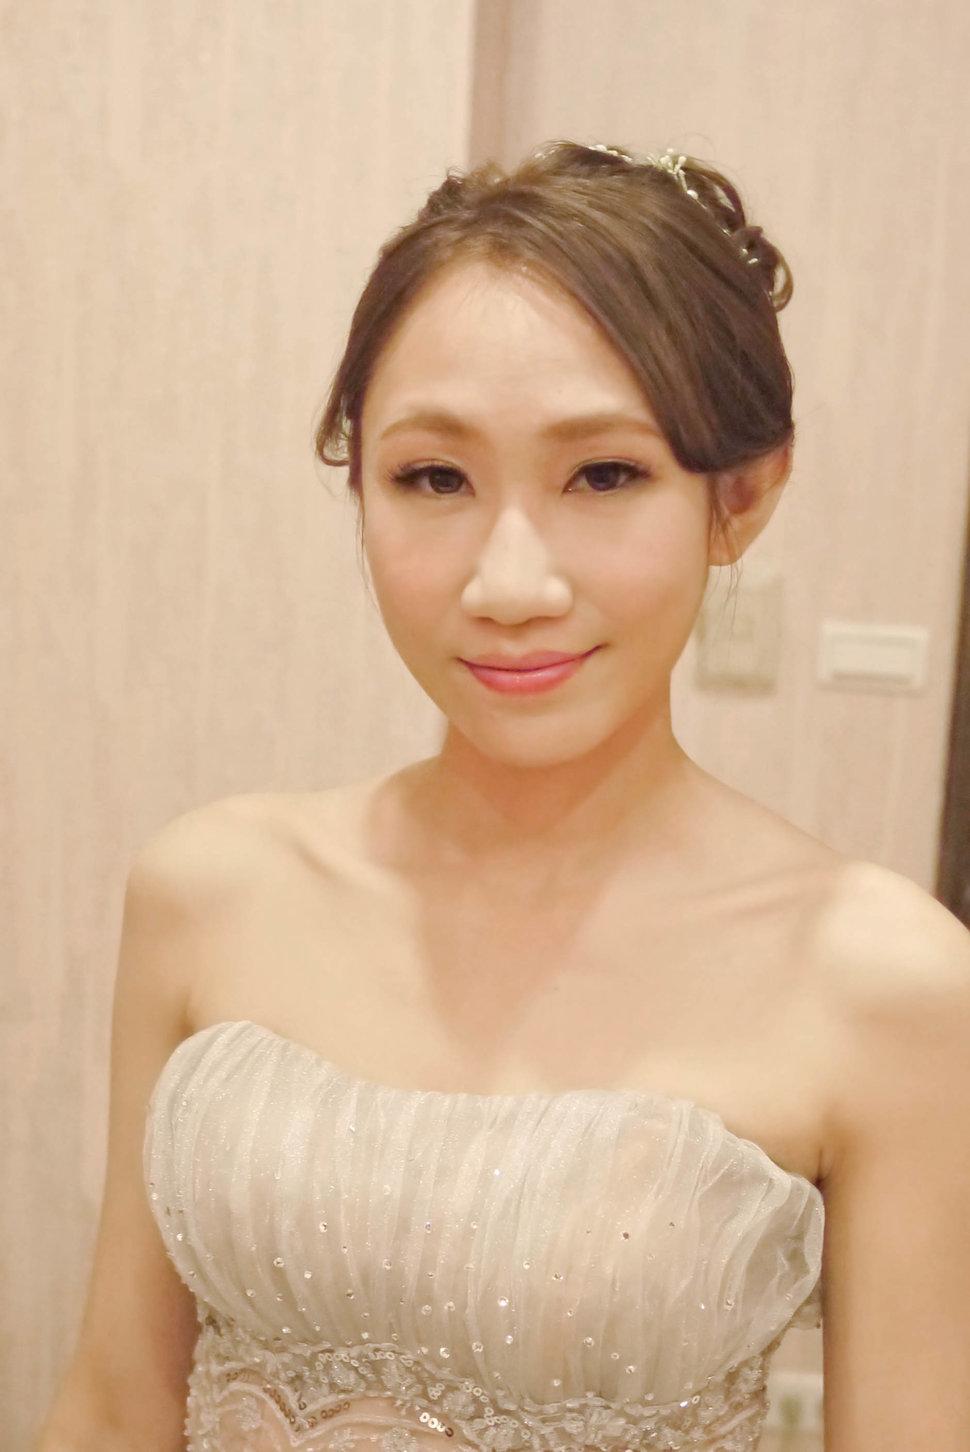 佩穎台北結婚 - Bella昱霖MakeupStudio - 結婚吧